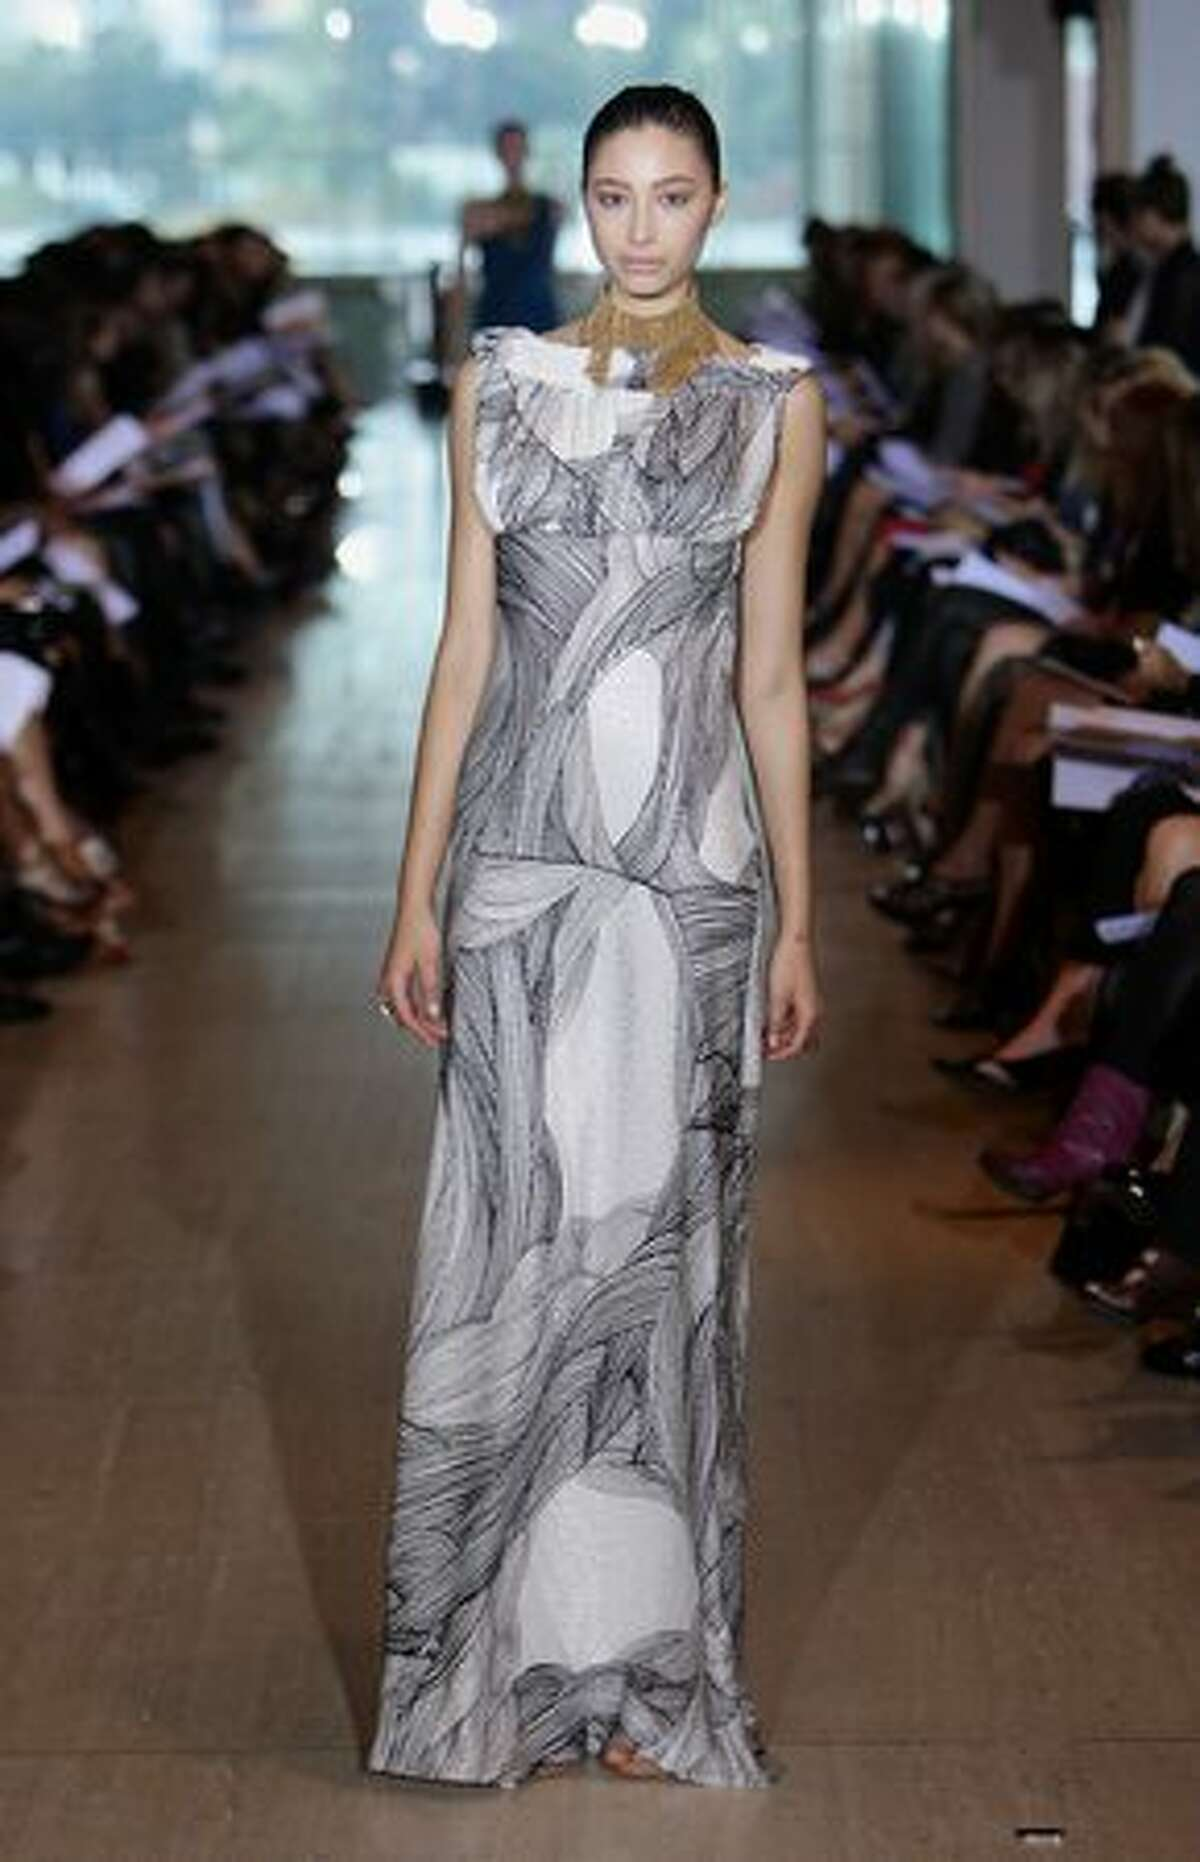 A model showcases a design by Lisa Ho.